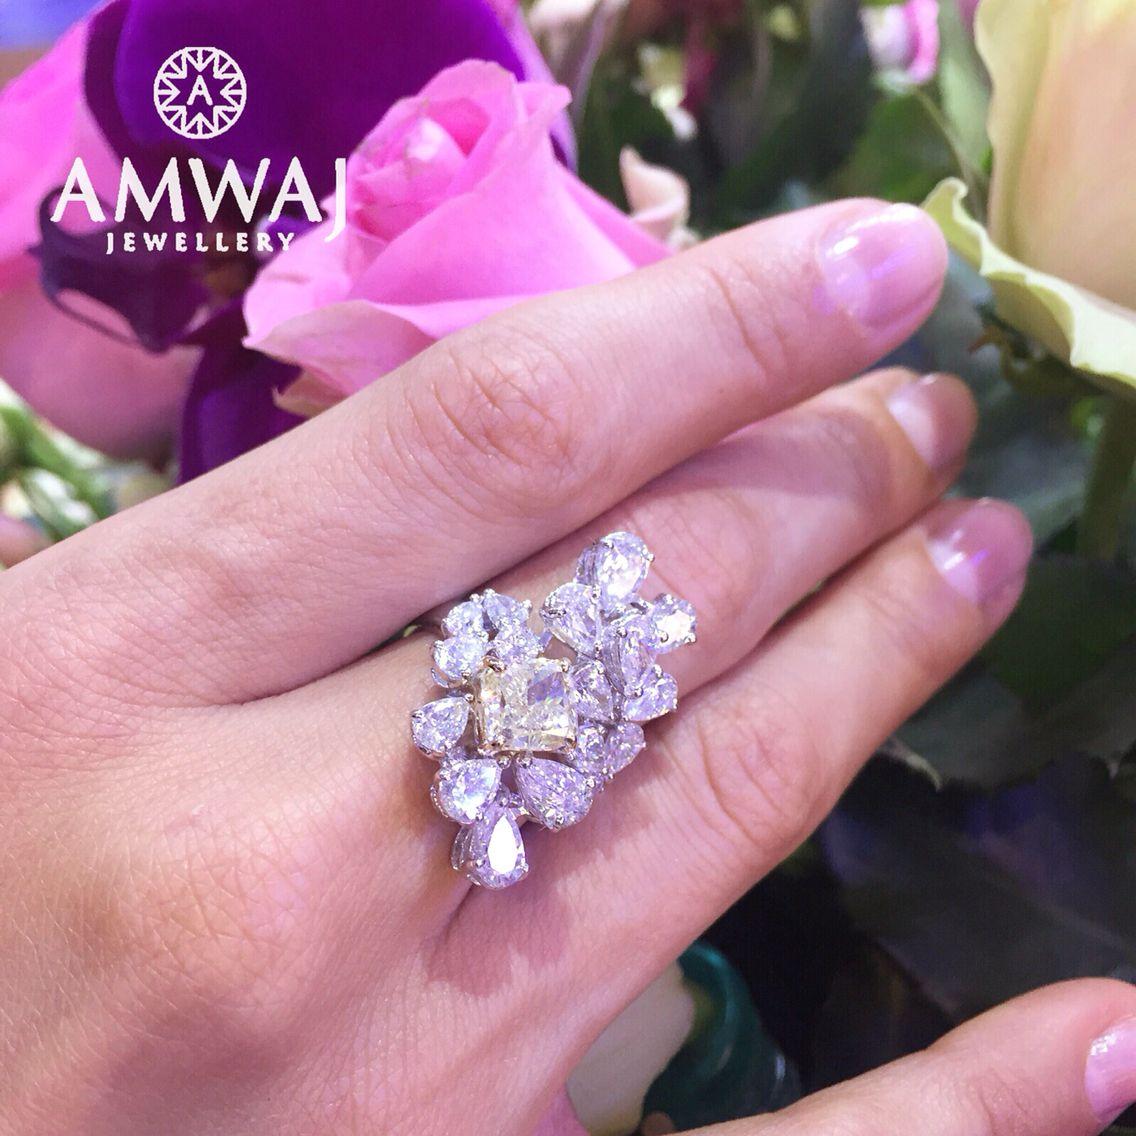 Amwaj Jewellery | Diamonds | Pinterest | Ring, Diamond and Jewel